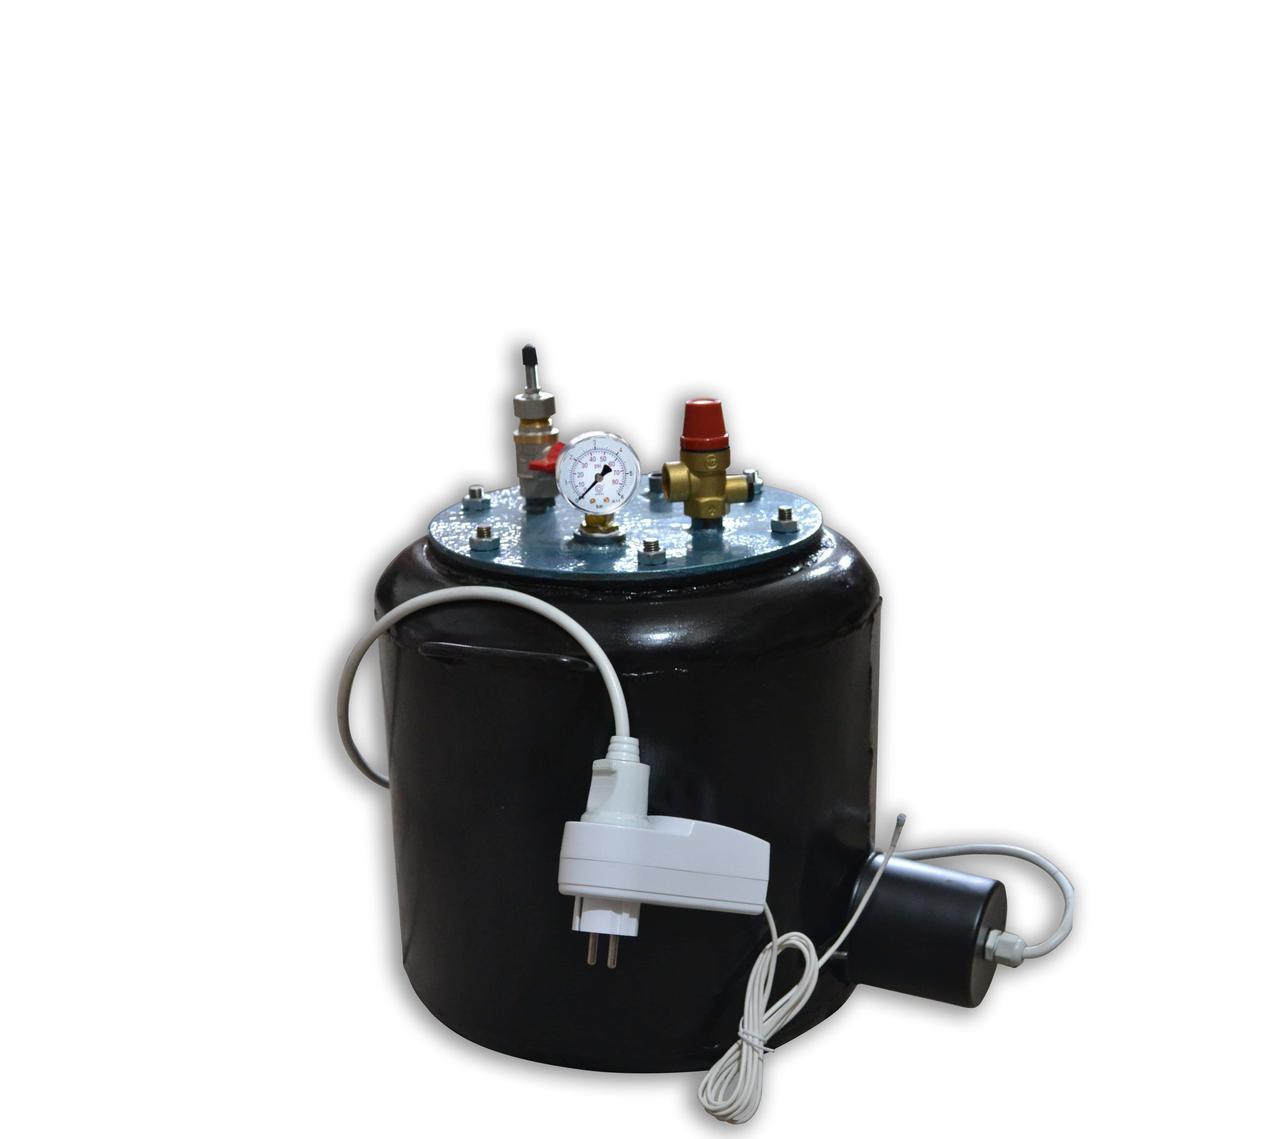 Автоклав электрический УТех-8 electro (1л-7шт, 0,5л-8шт)